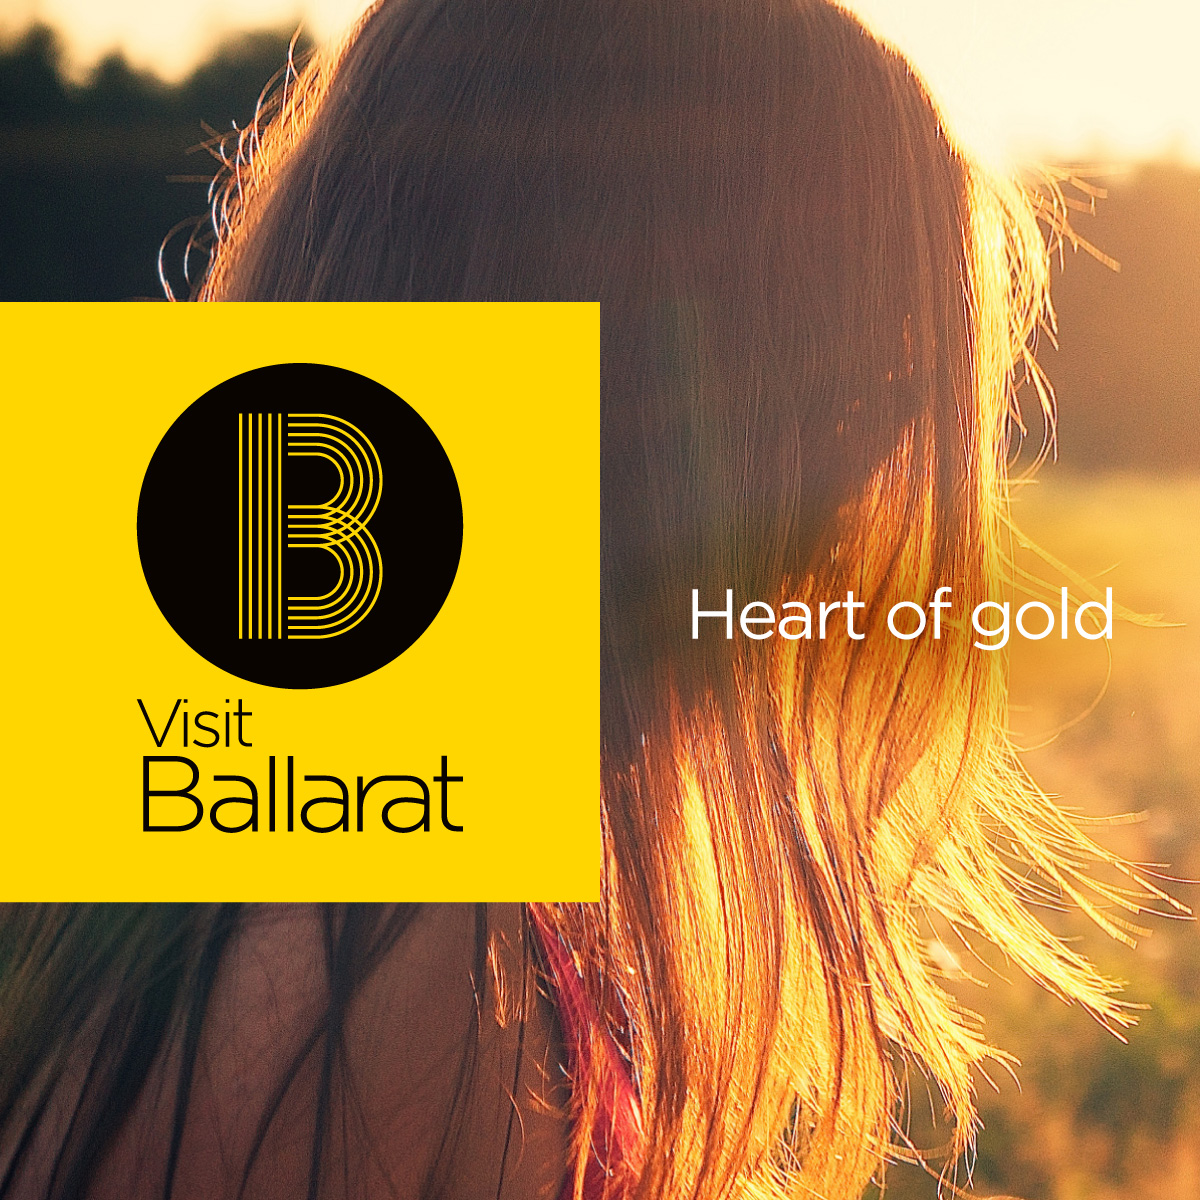 Visit Ballarat Brand Strategy and Identity System